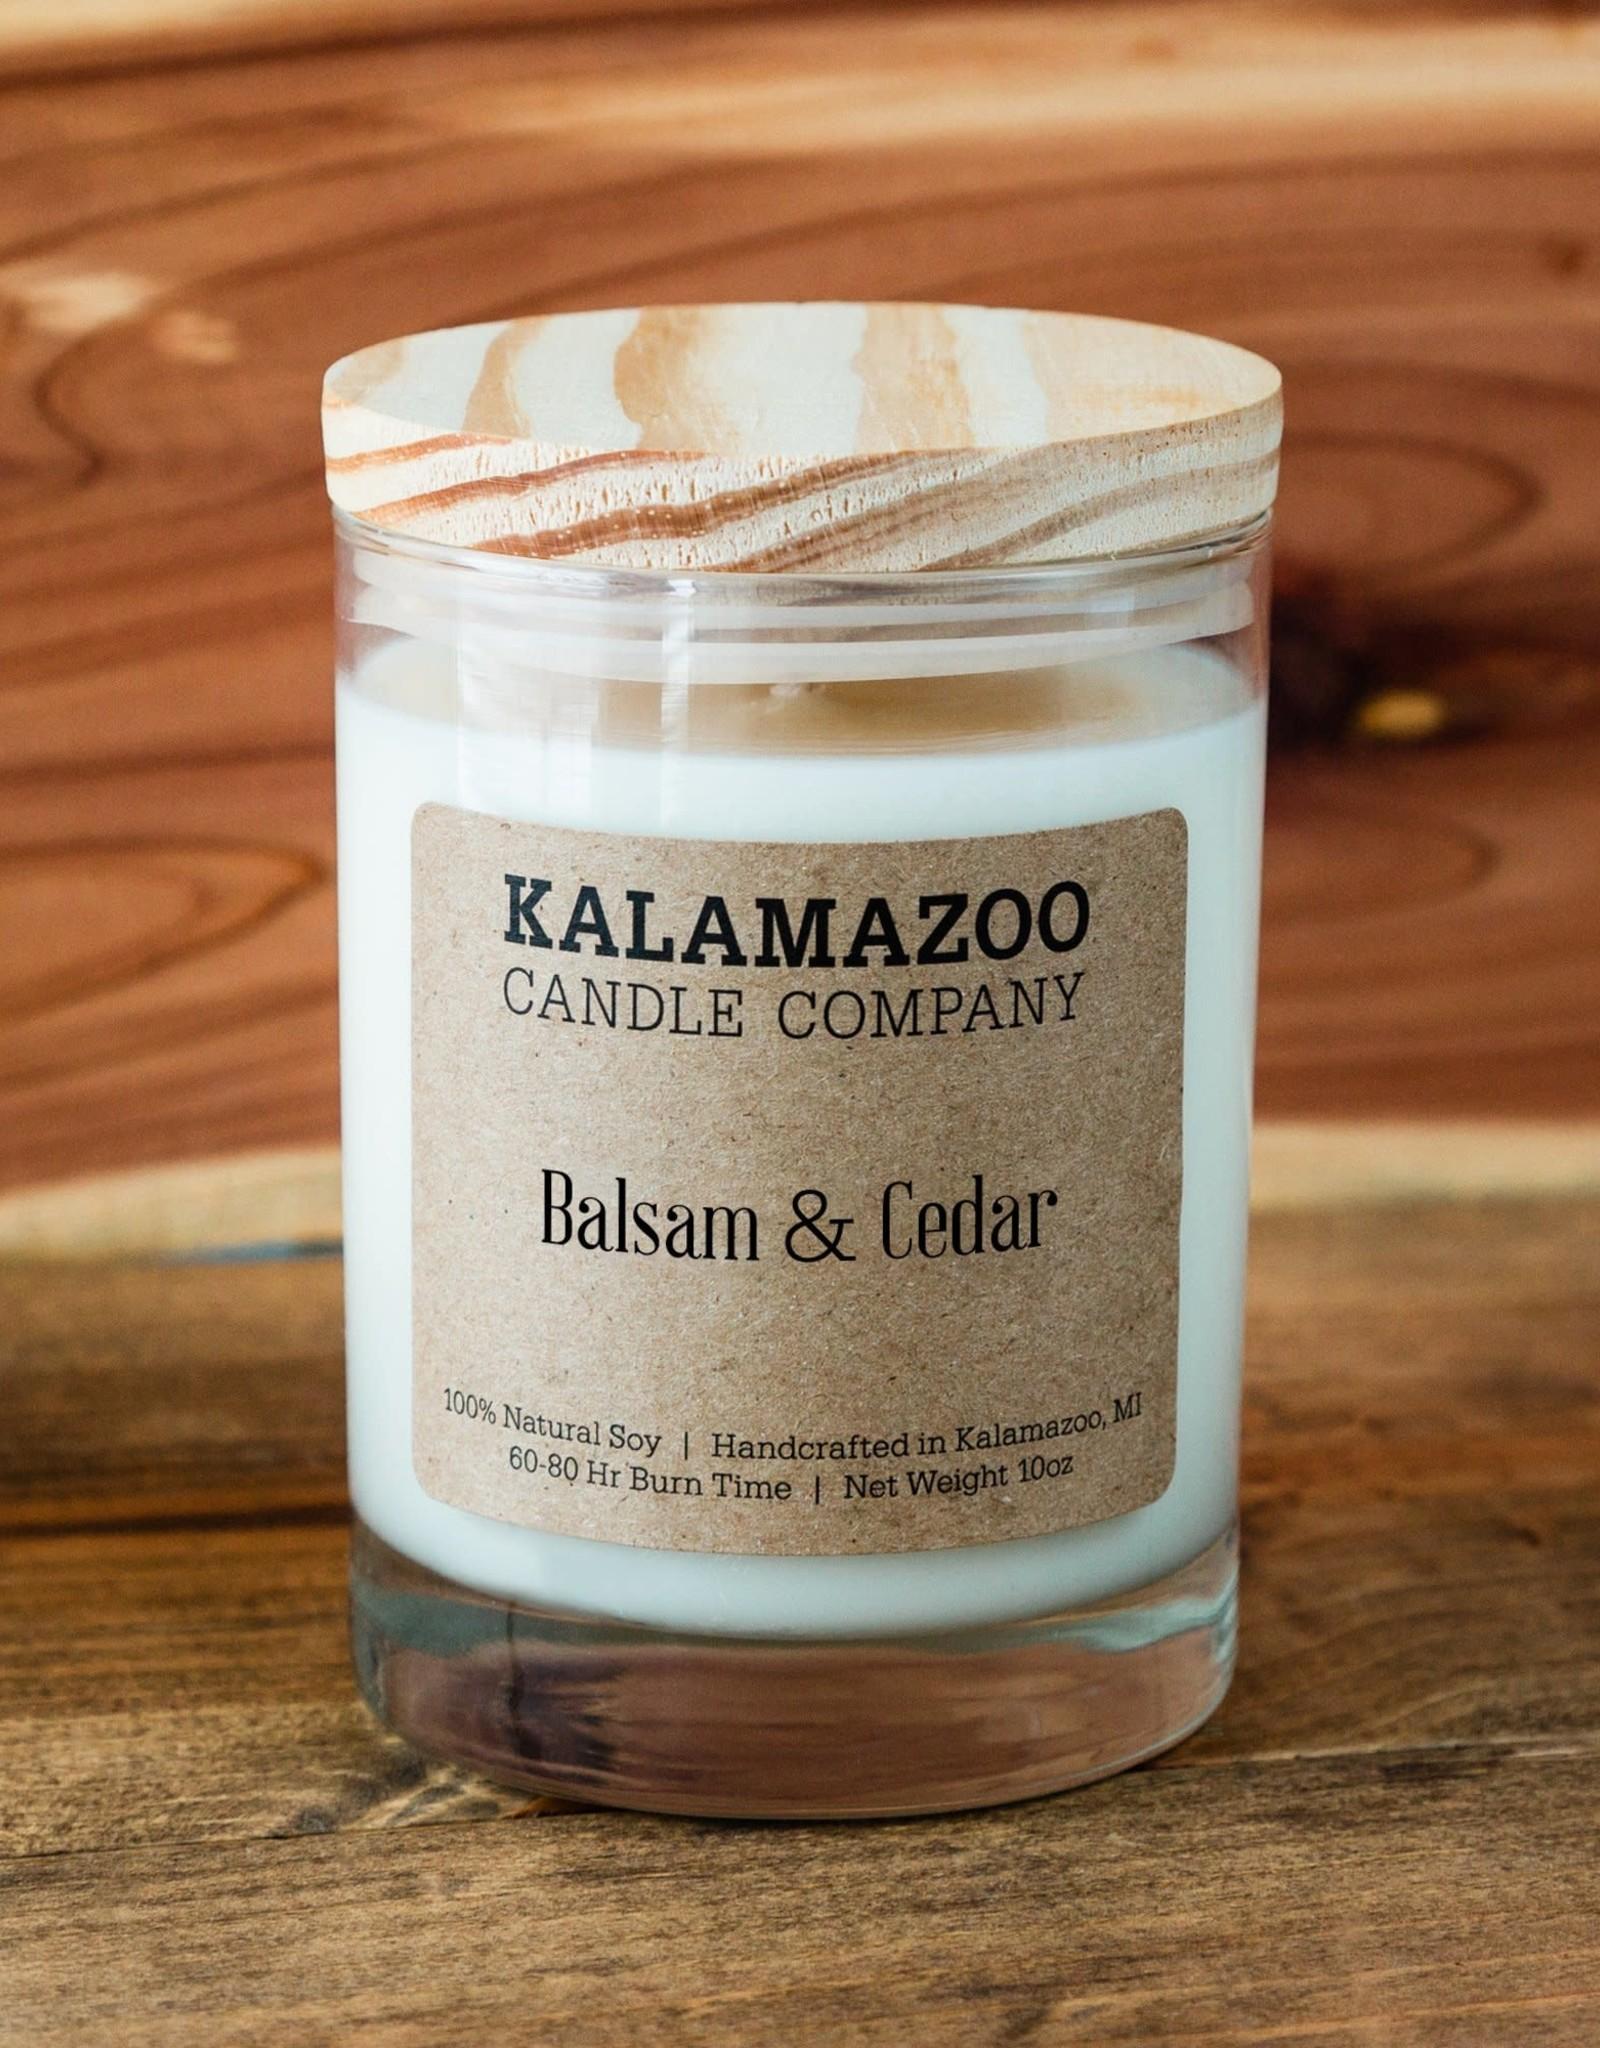 Kalamazoo Candle Co. Kalamazoo Candle Co. | Balsam & Cedar 10oz Jar